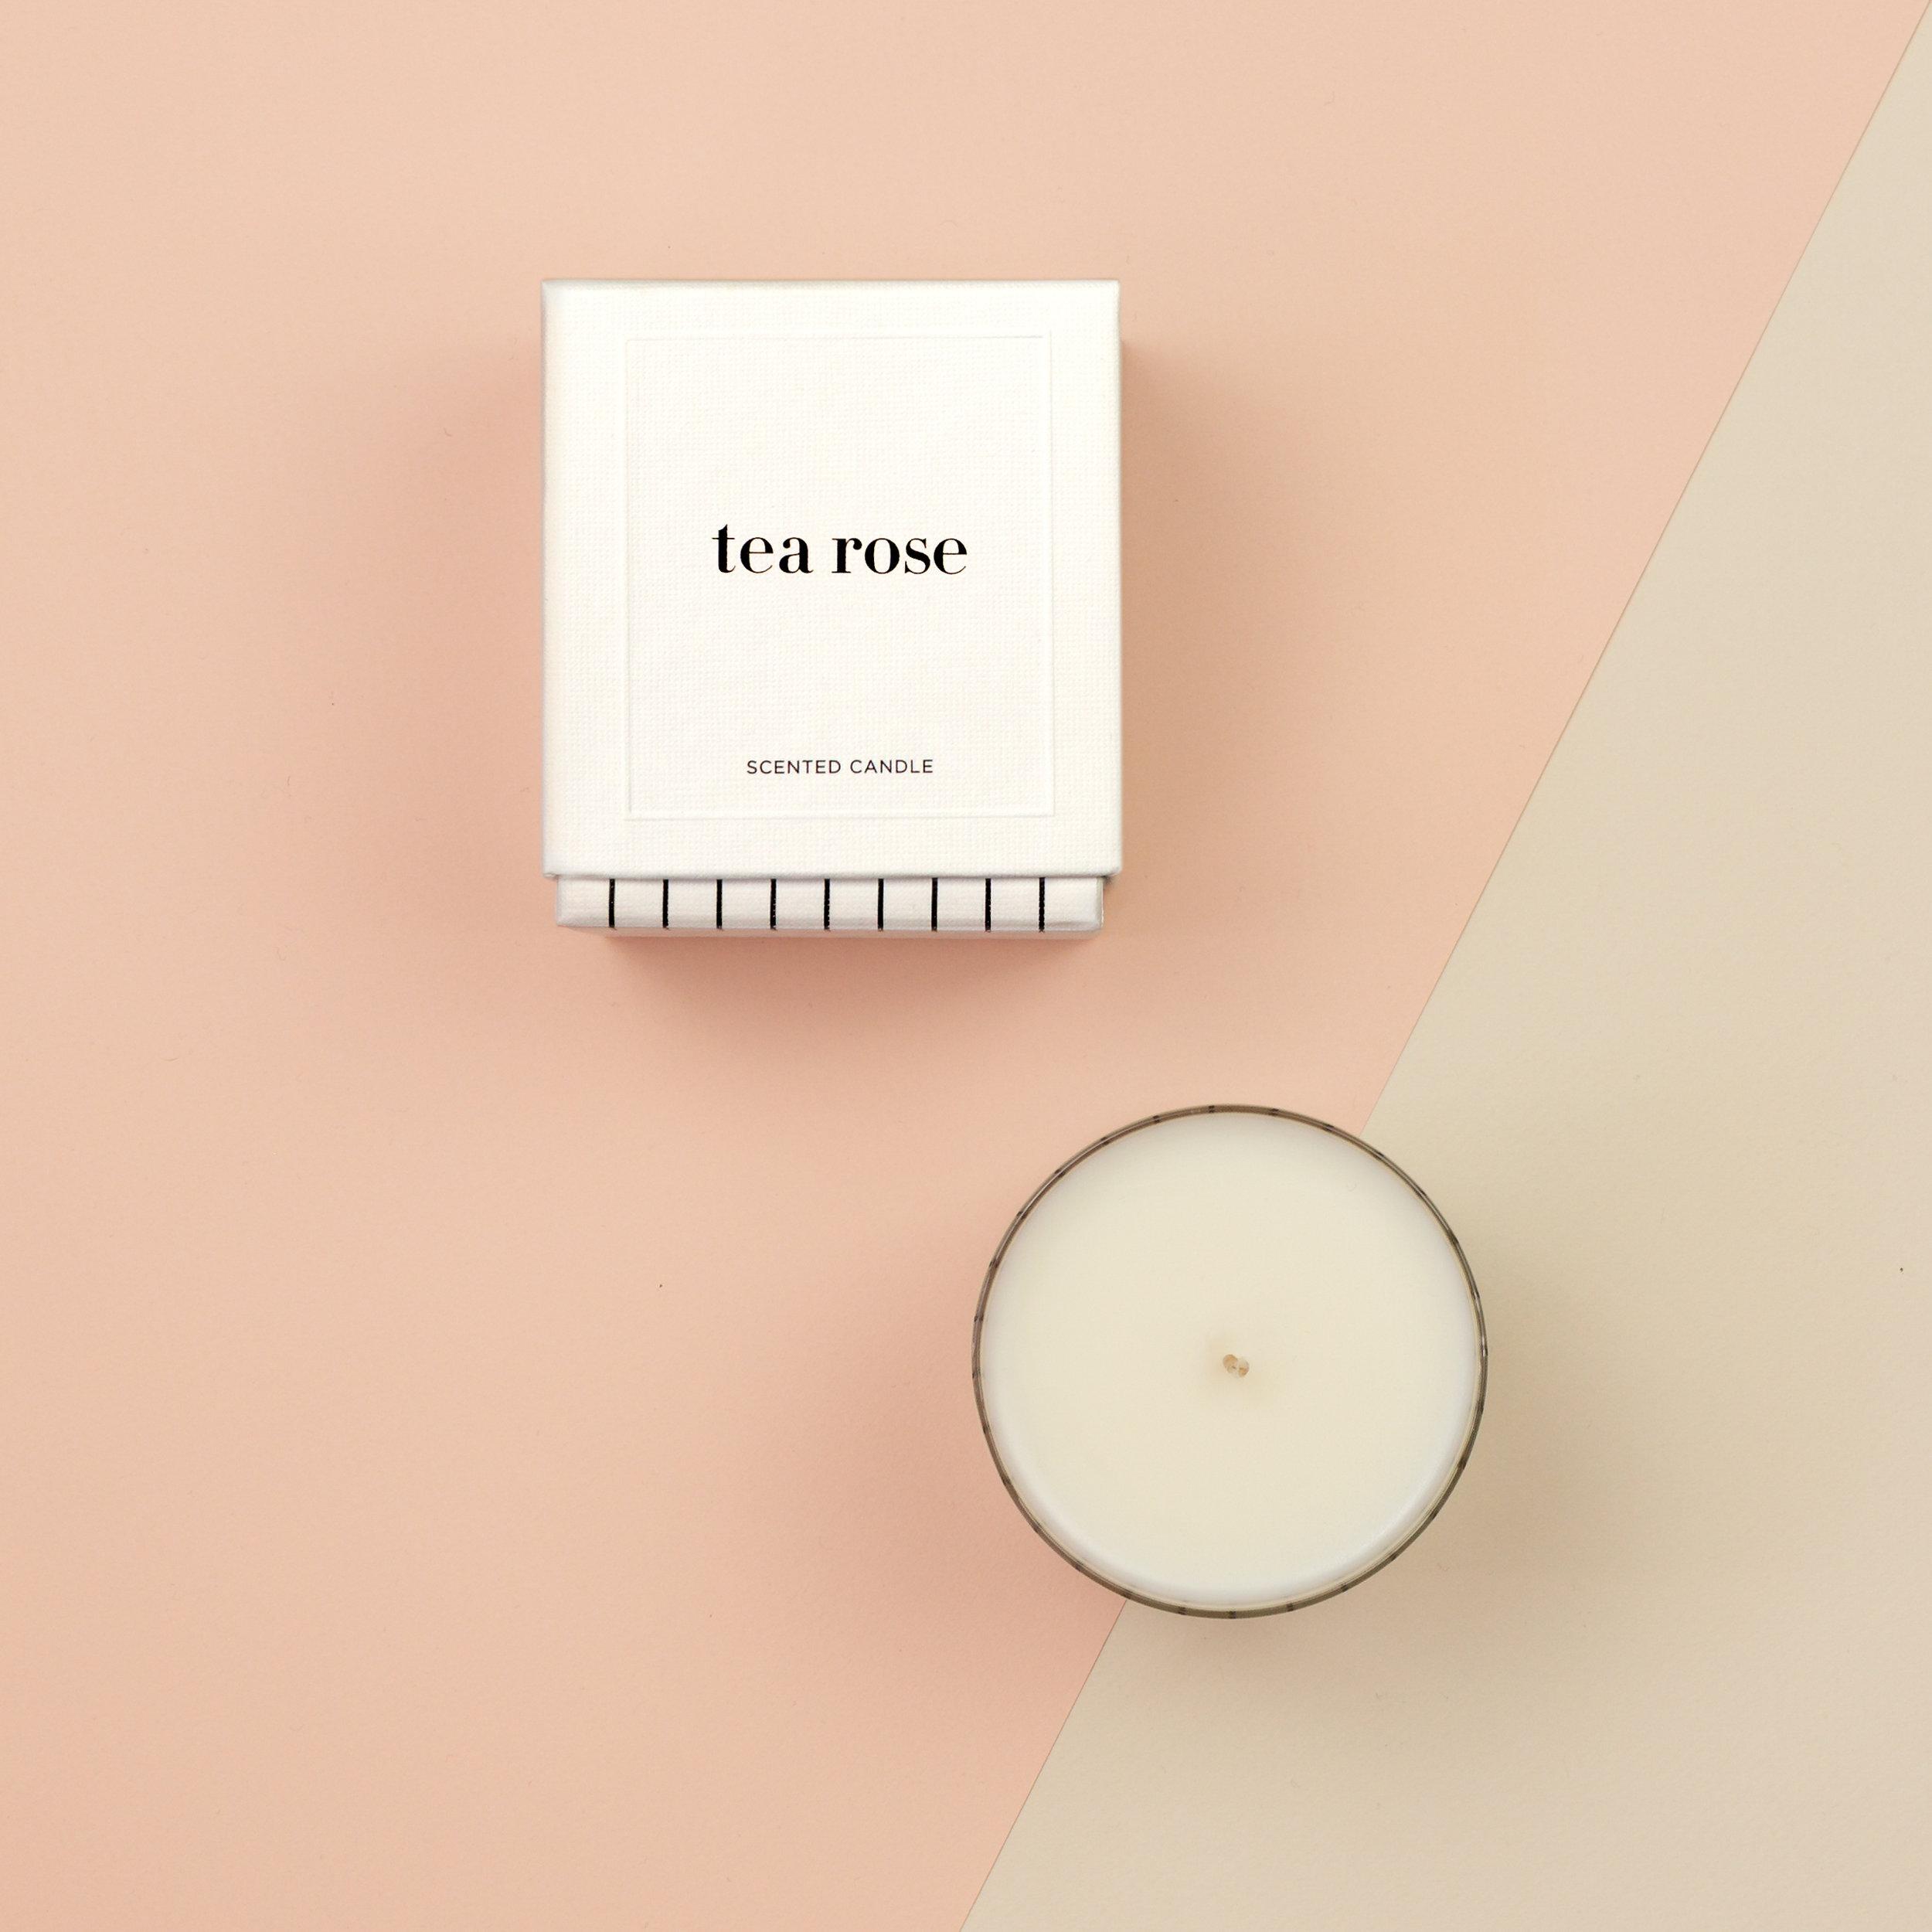 Studio_Stockhome_flat_tea rose.jpg